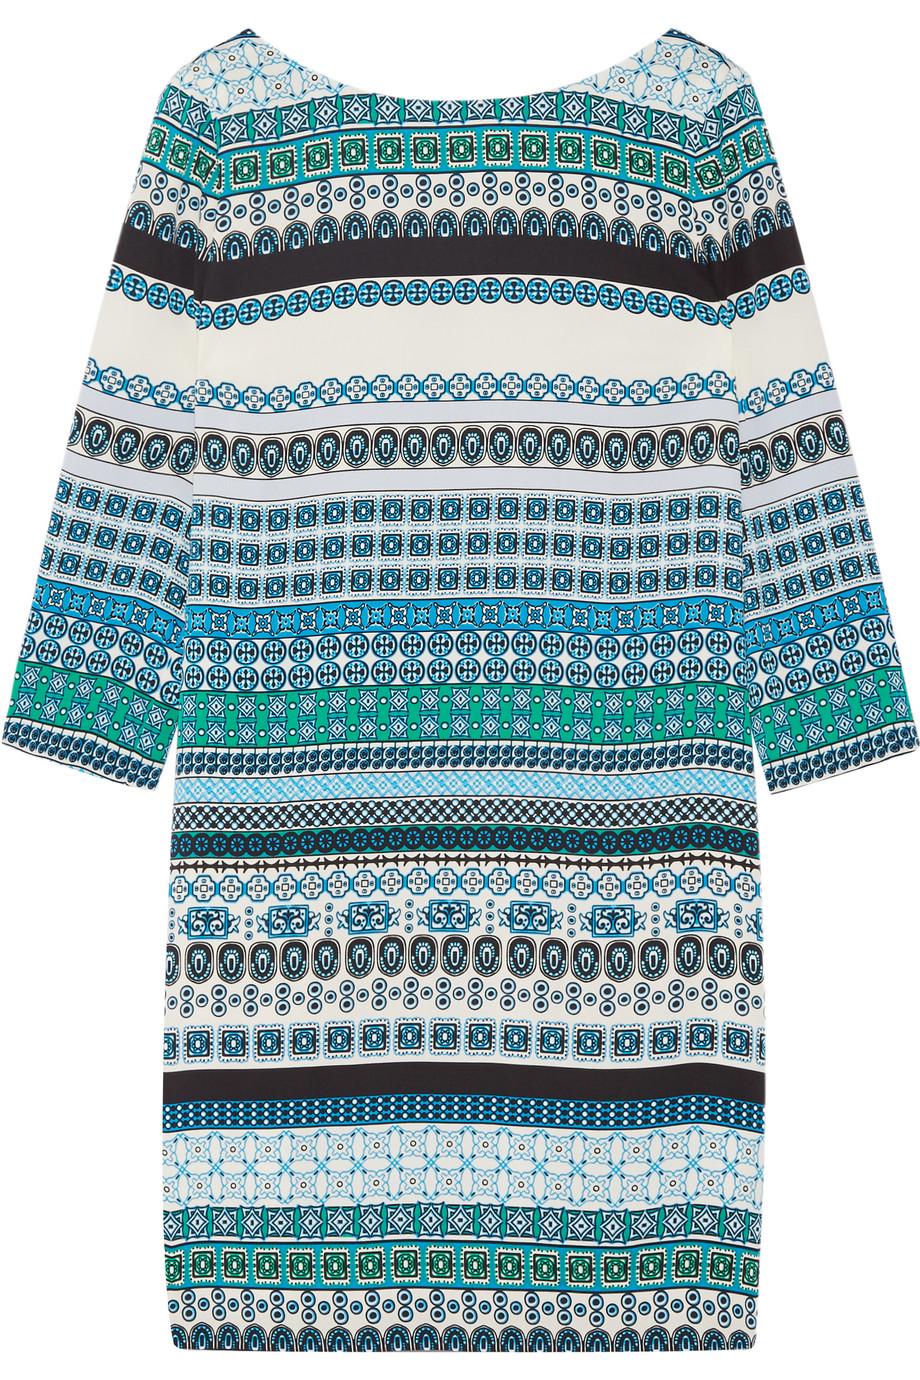 Diane Von Furstenberg Avery Printed Stretch-Silk Mini Dress, Blue, Women's - Printed, Size: 0